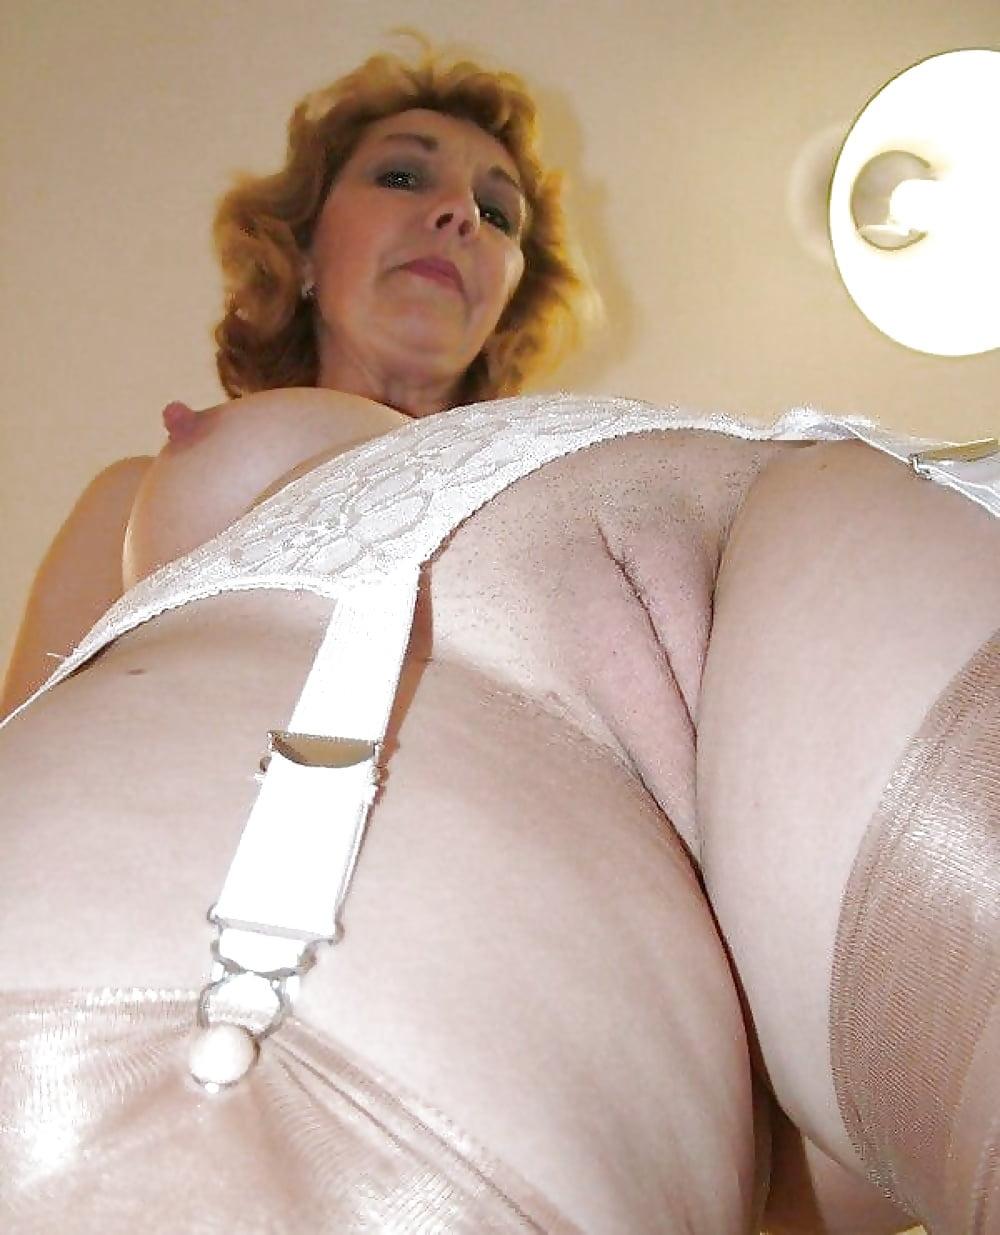 Panties granny pic, free women gallery